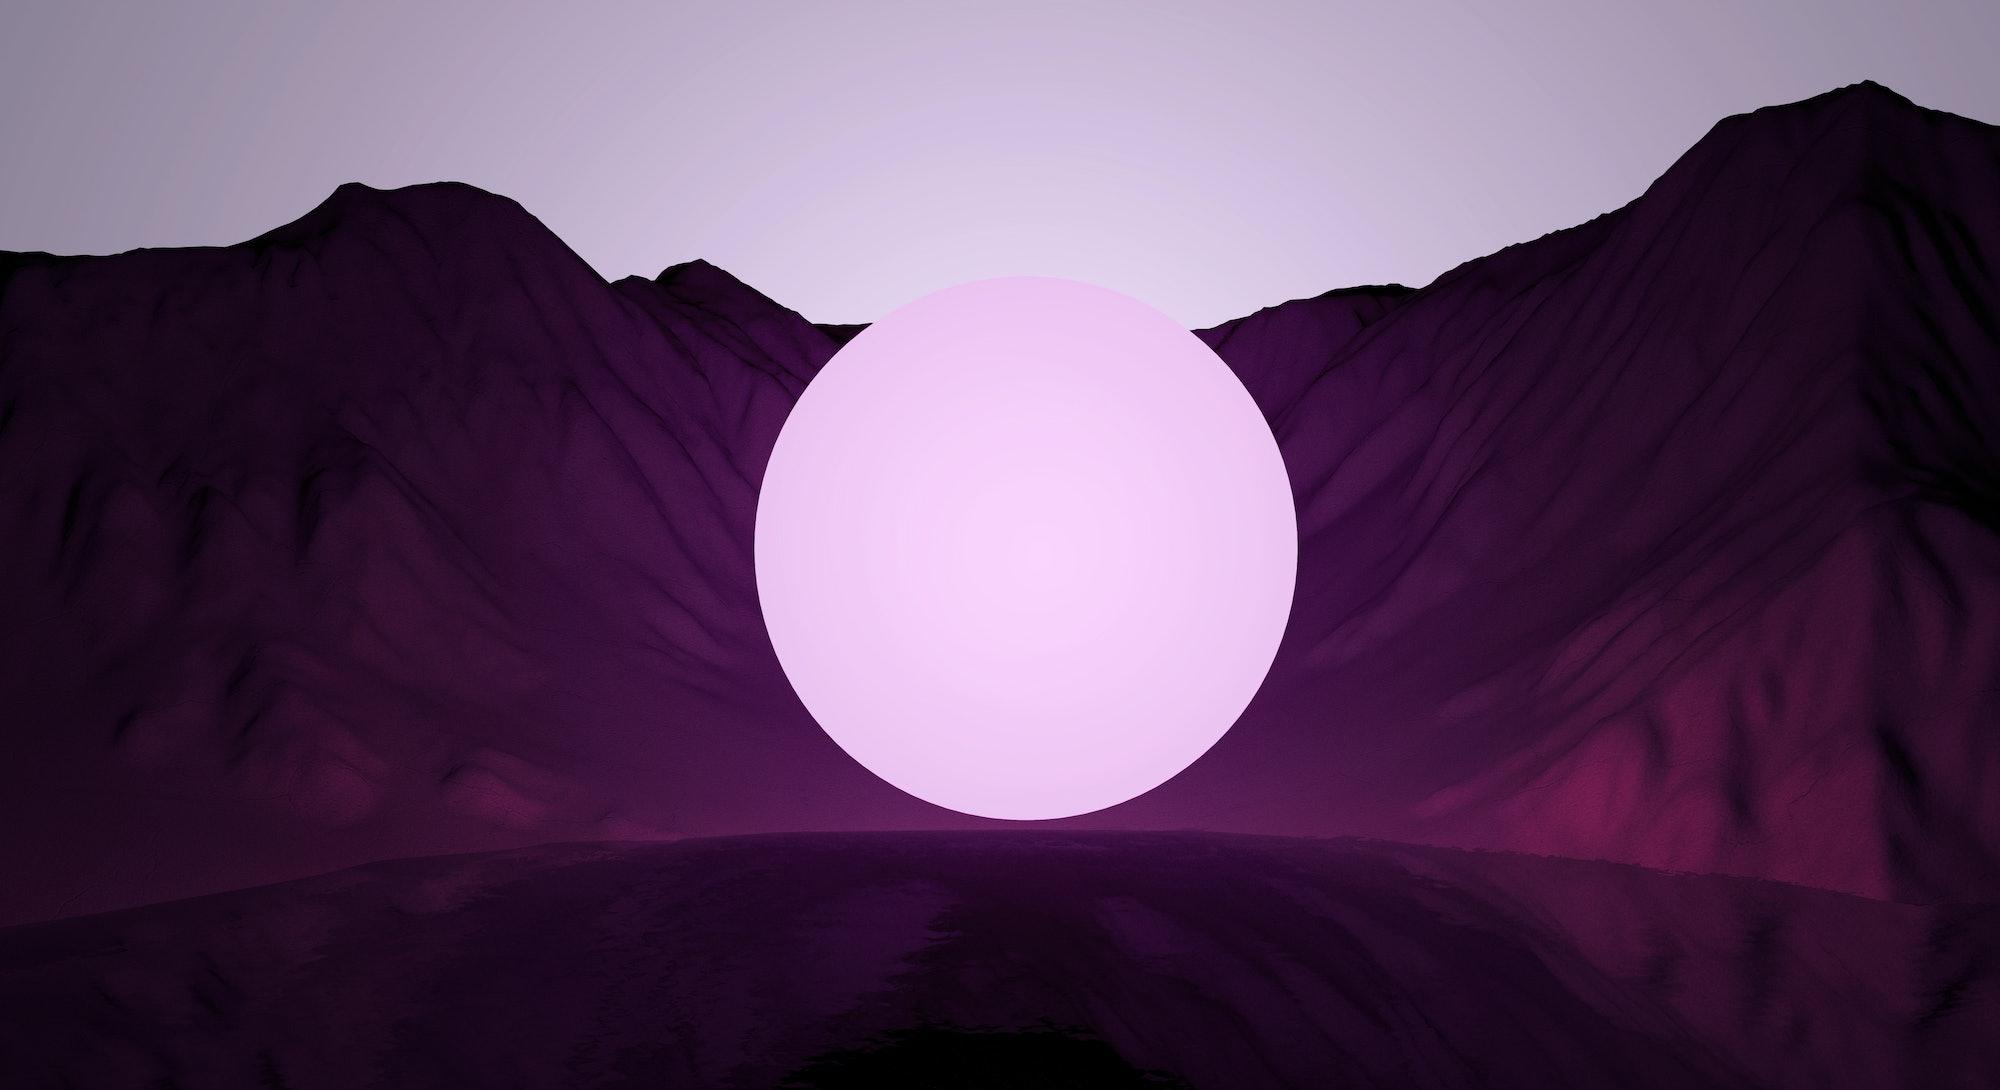 stylized digital sphere against a purple background